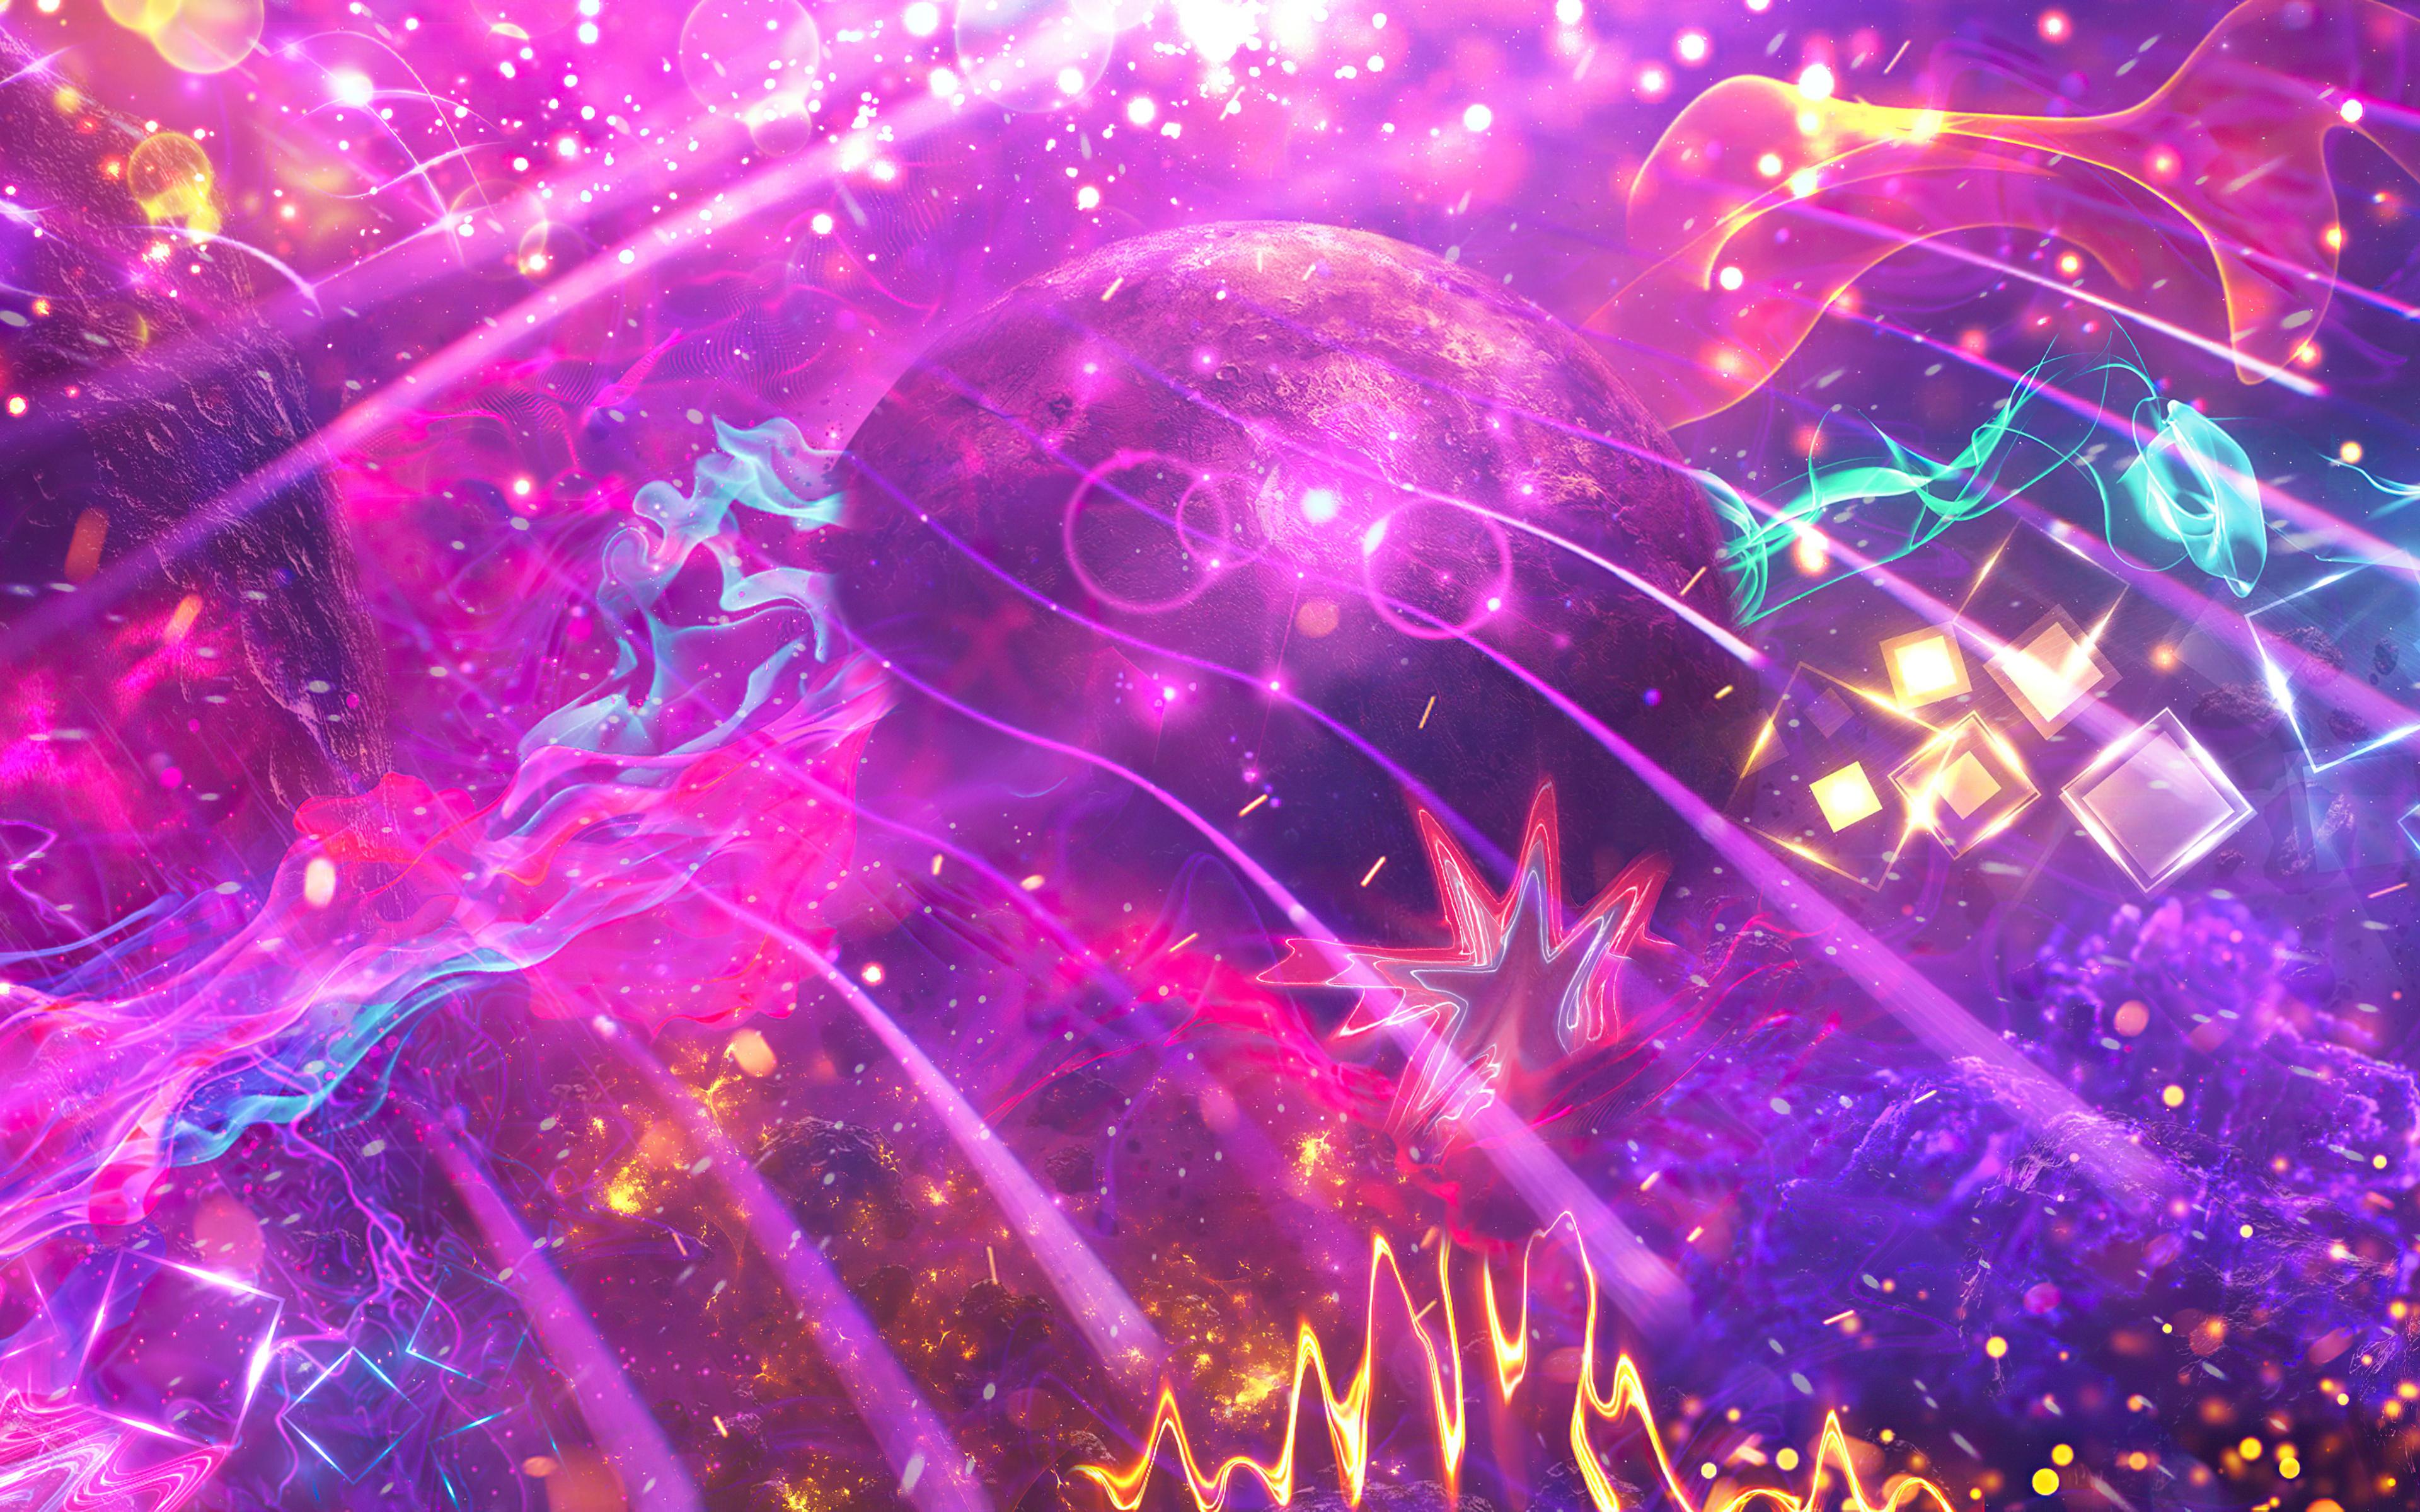 nebula-neon-colors-fractal-glitch-pattern-waves-4k-tq.jpg